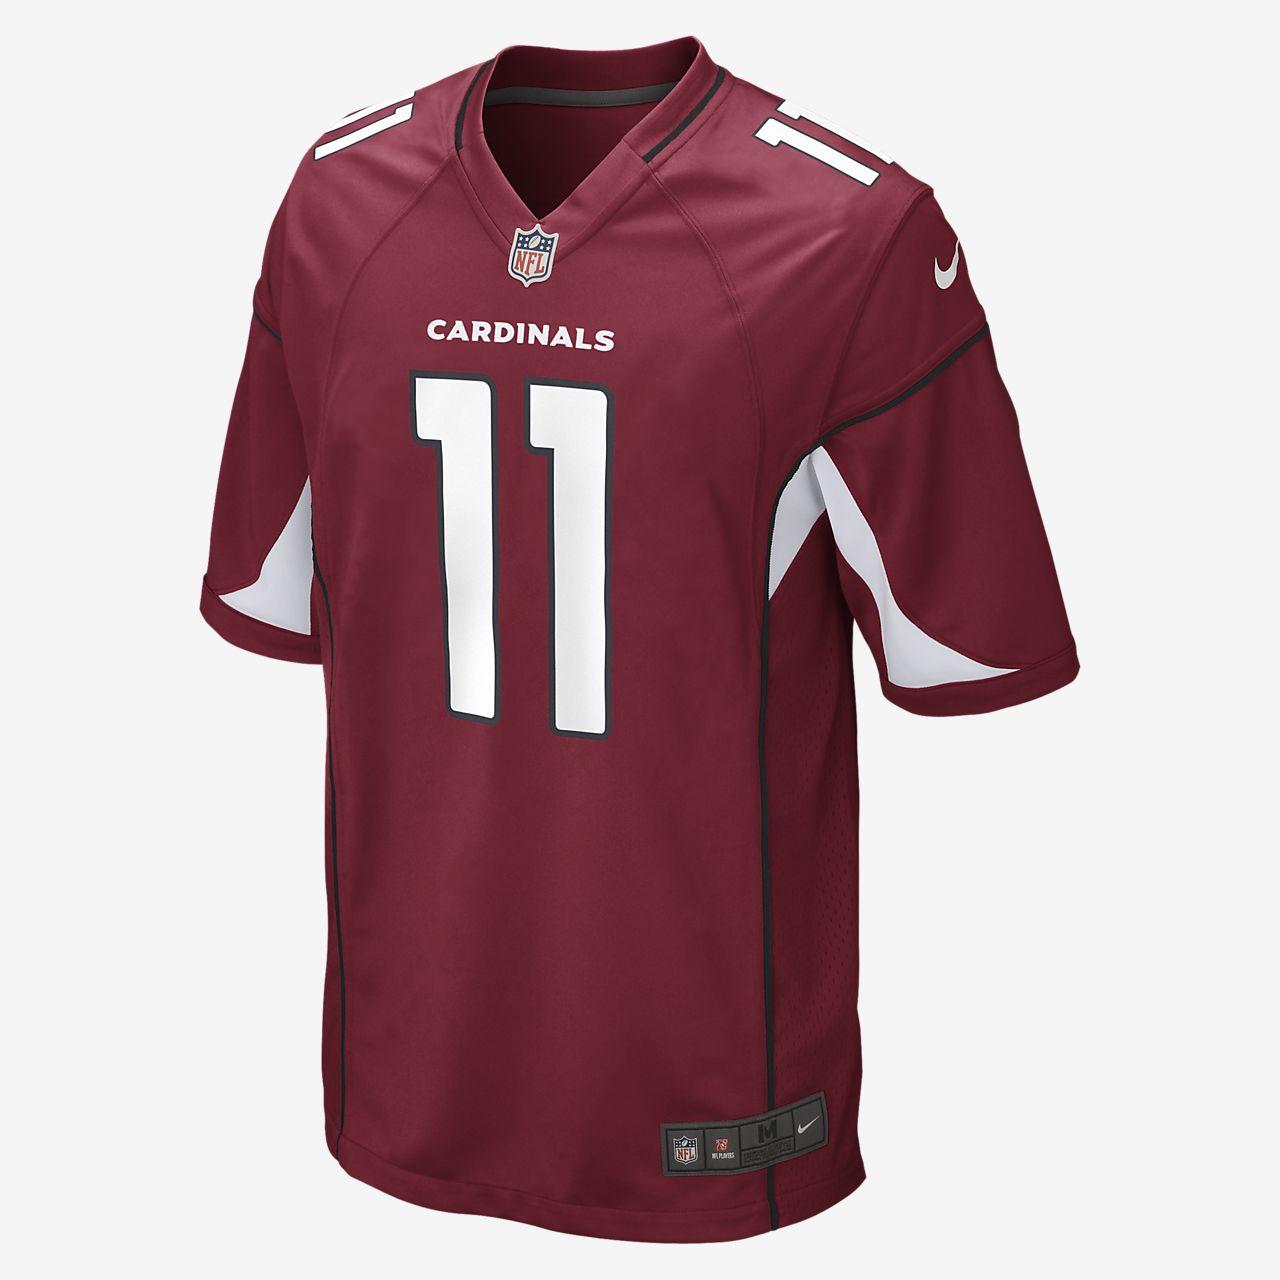 NFL Arizona Cardinals (Larry Fitzgerald) Men's American Football Game Jersey